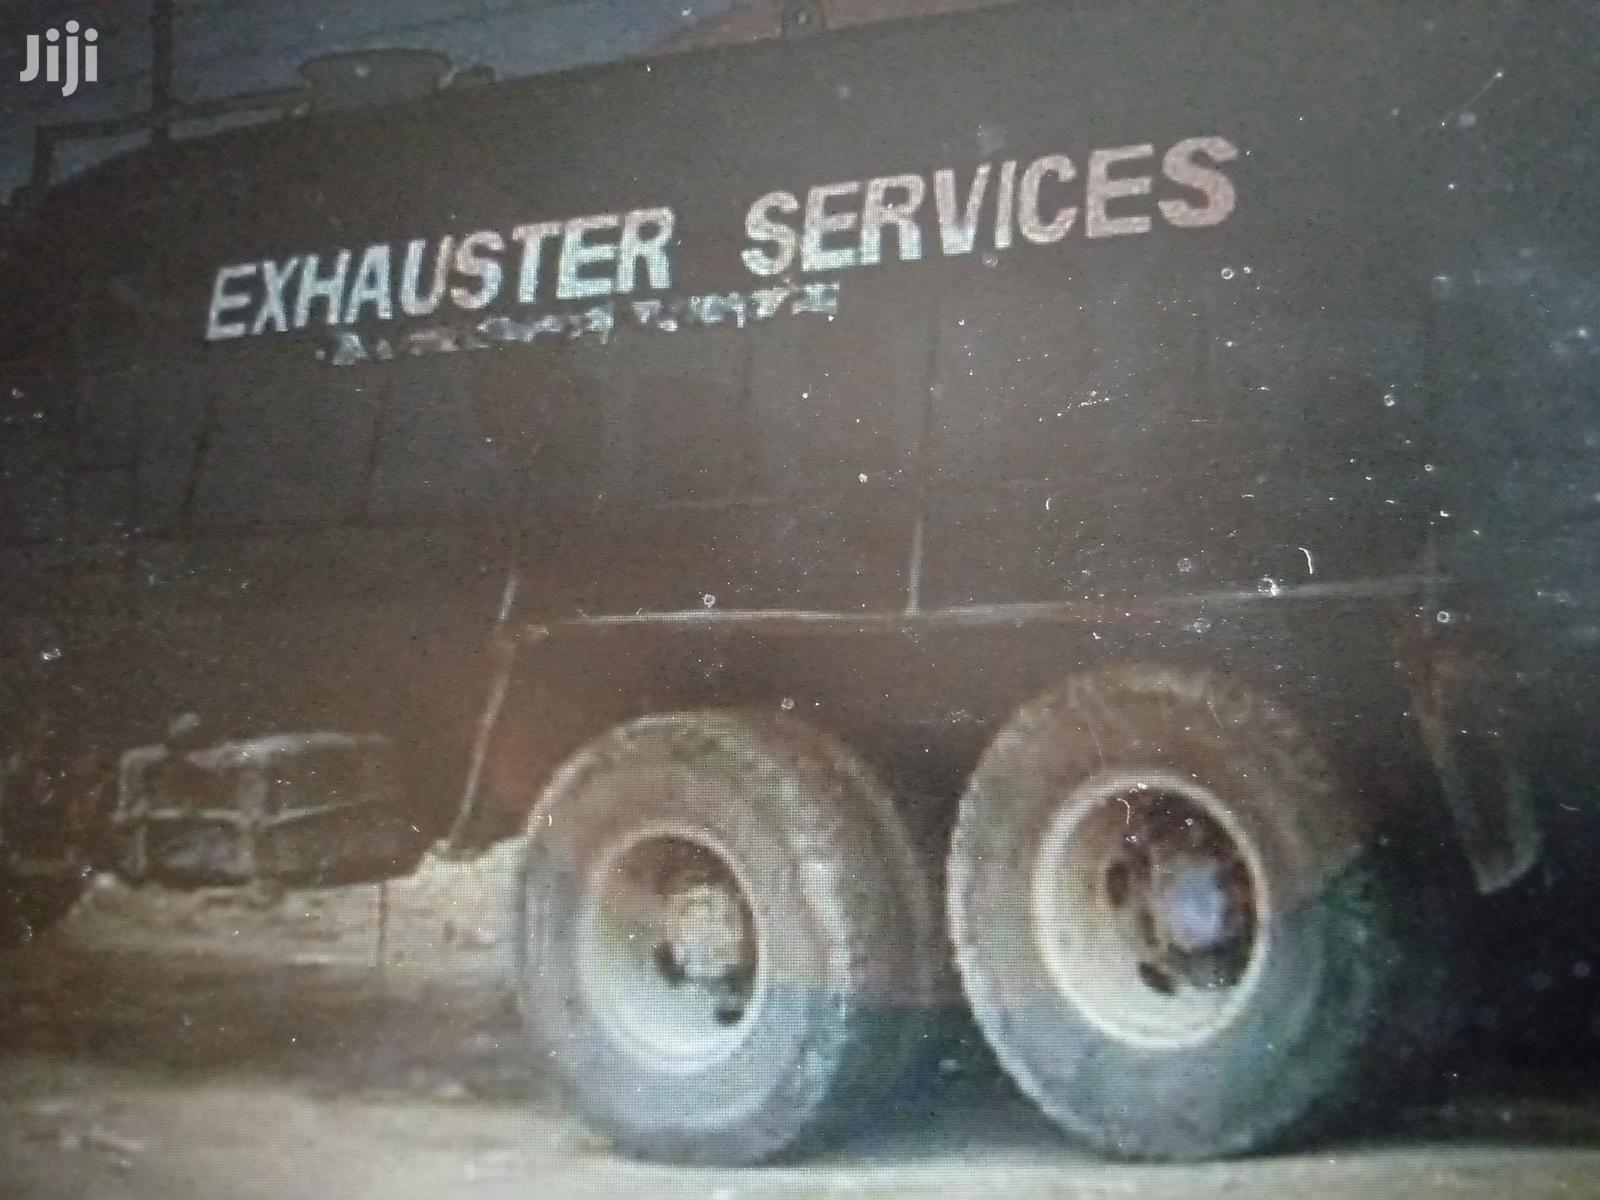 Sewage Exhauster Services In Runda